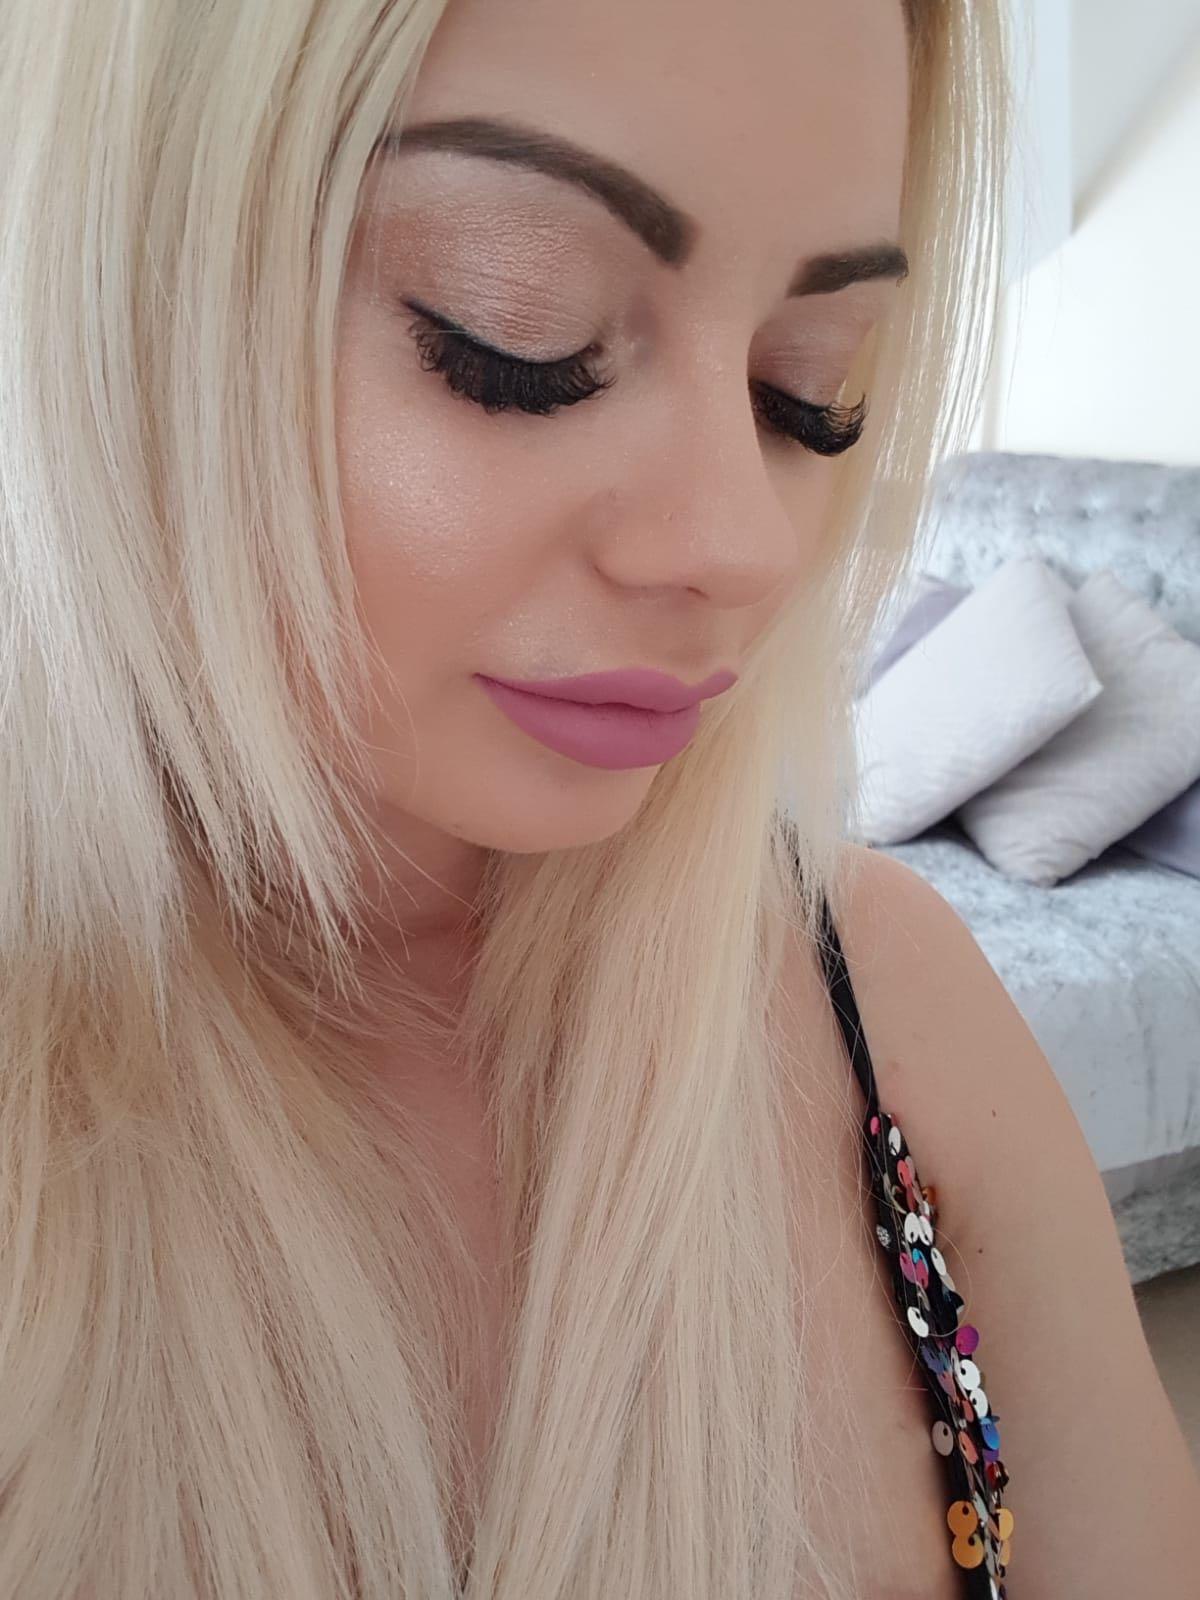 Layla Vardy's Anti-Wrinkle Treatment at Escape Aesthetics, Luton